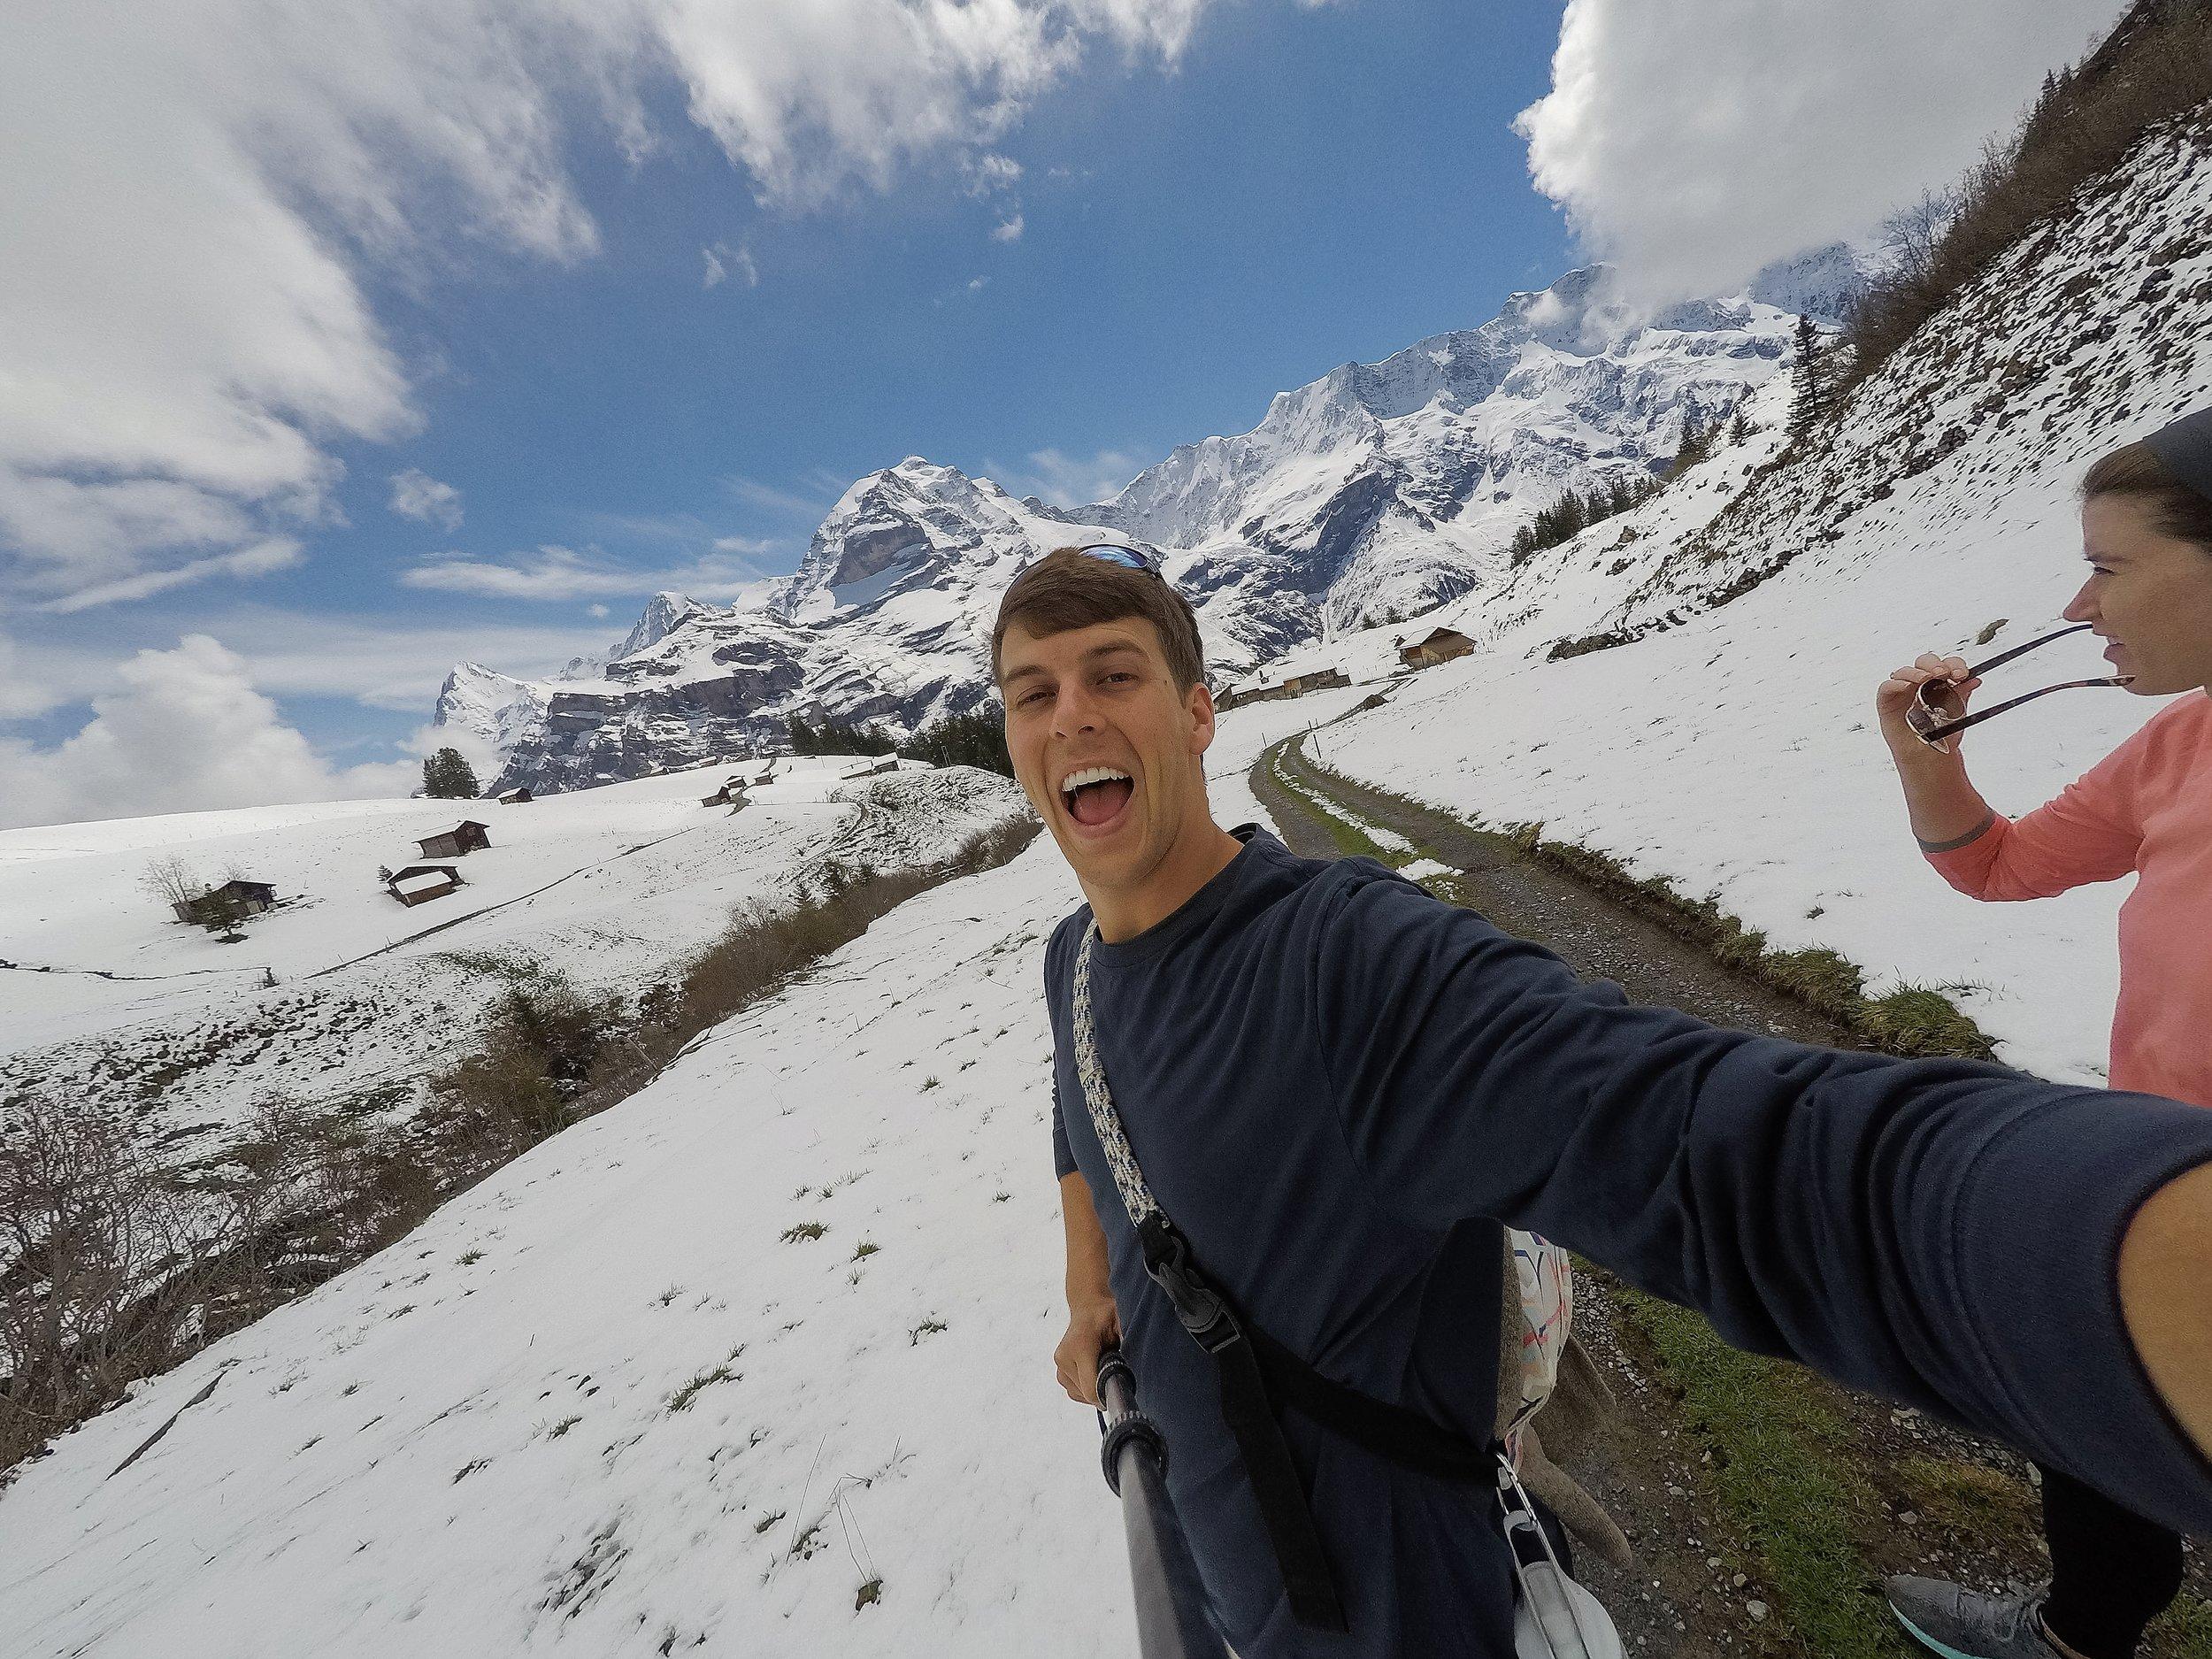 North Face Trail_0016.jpg